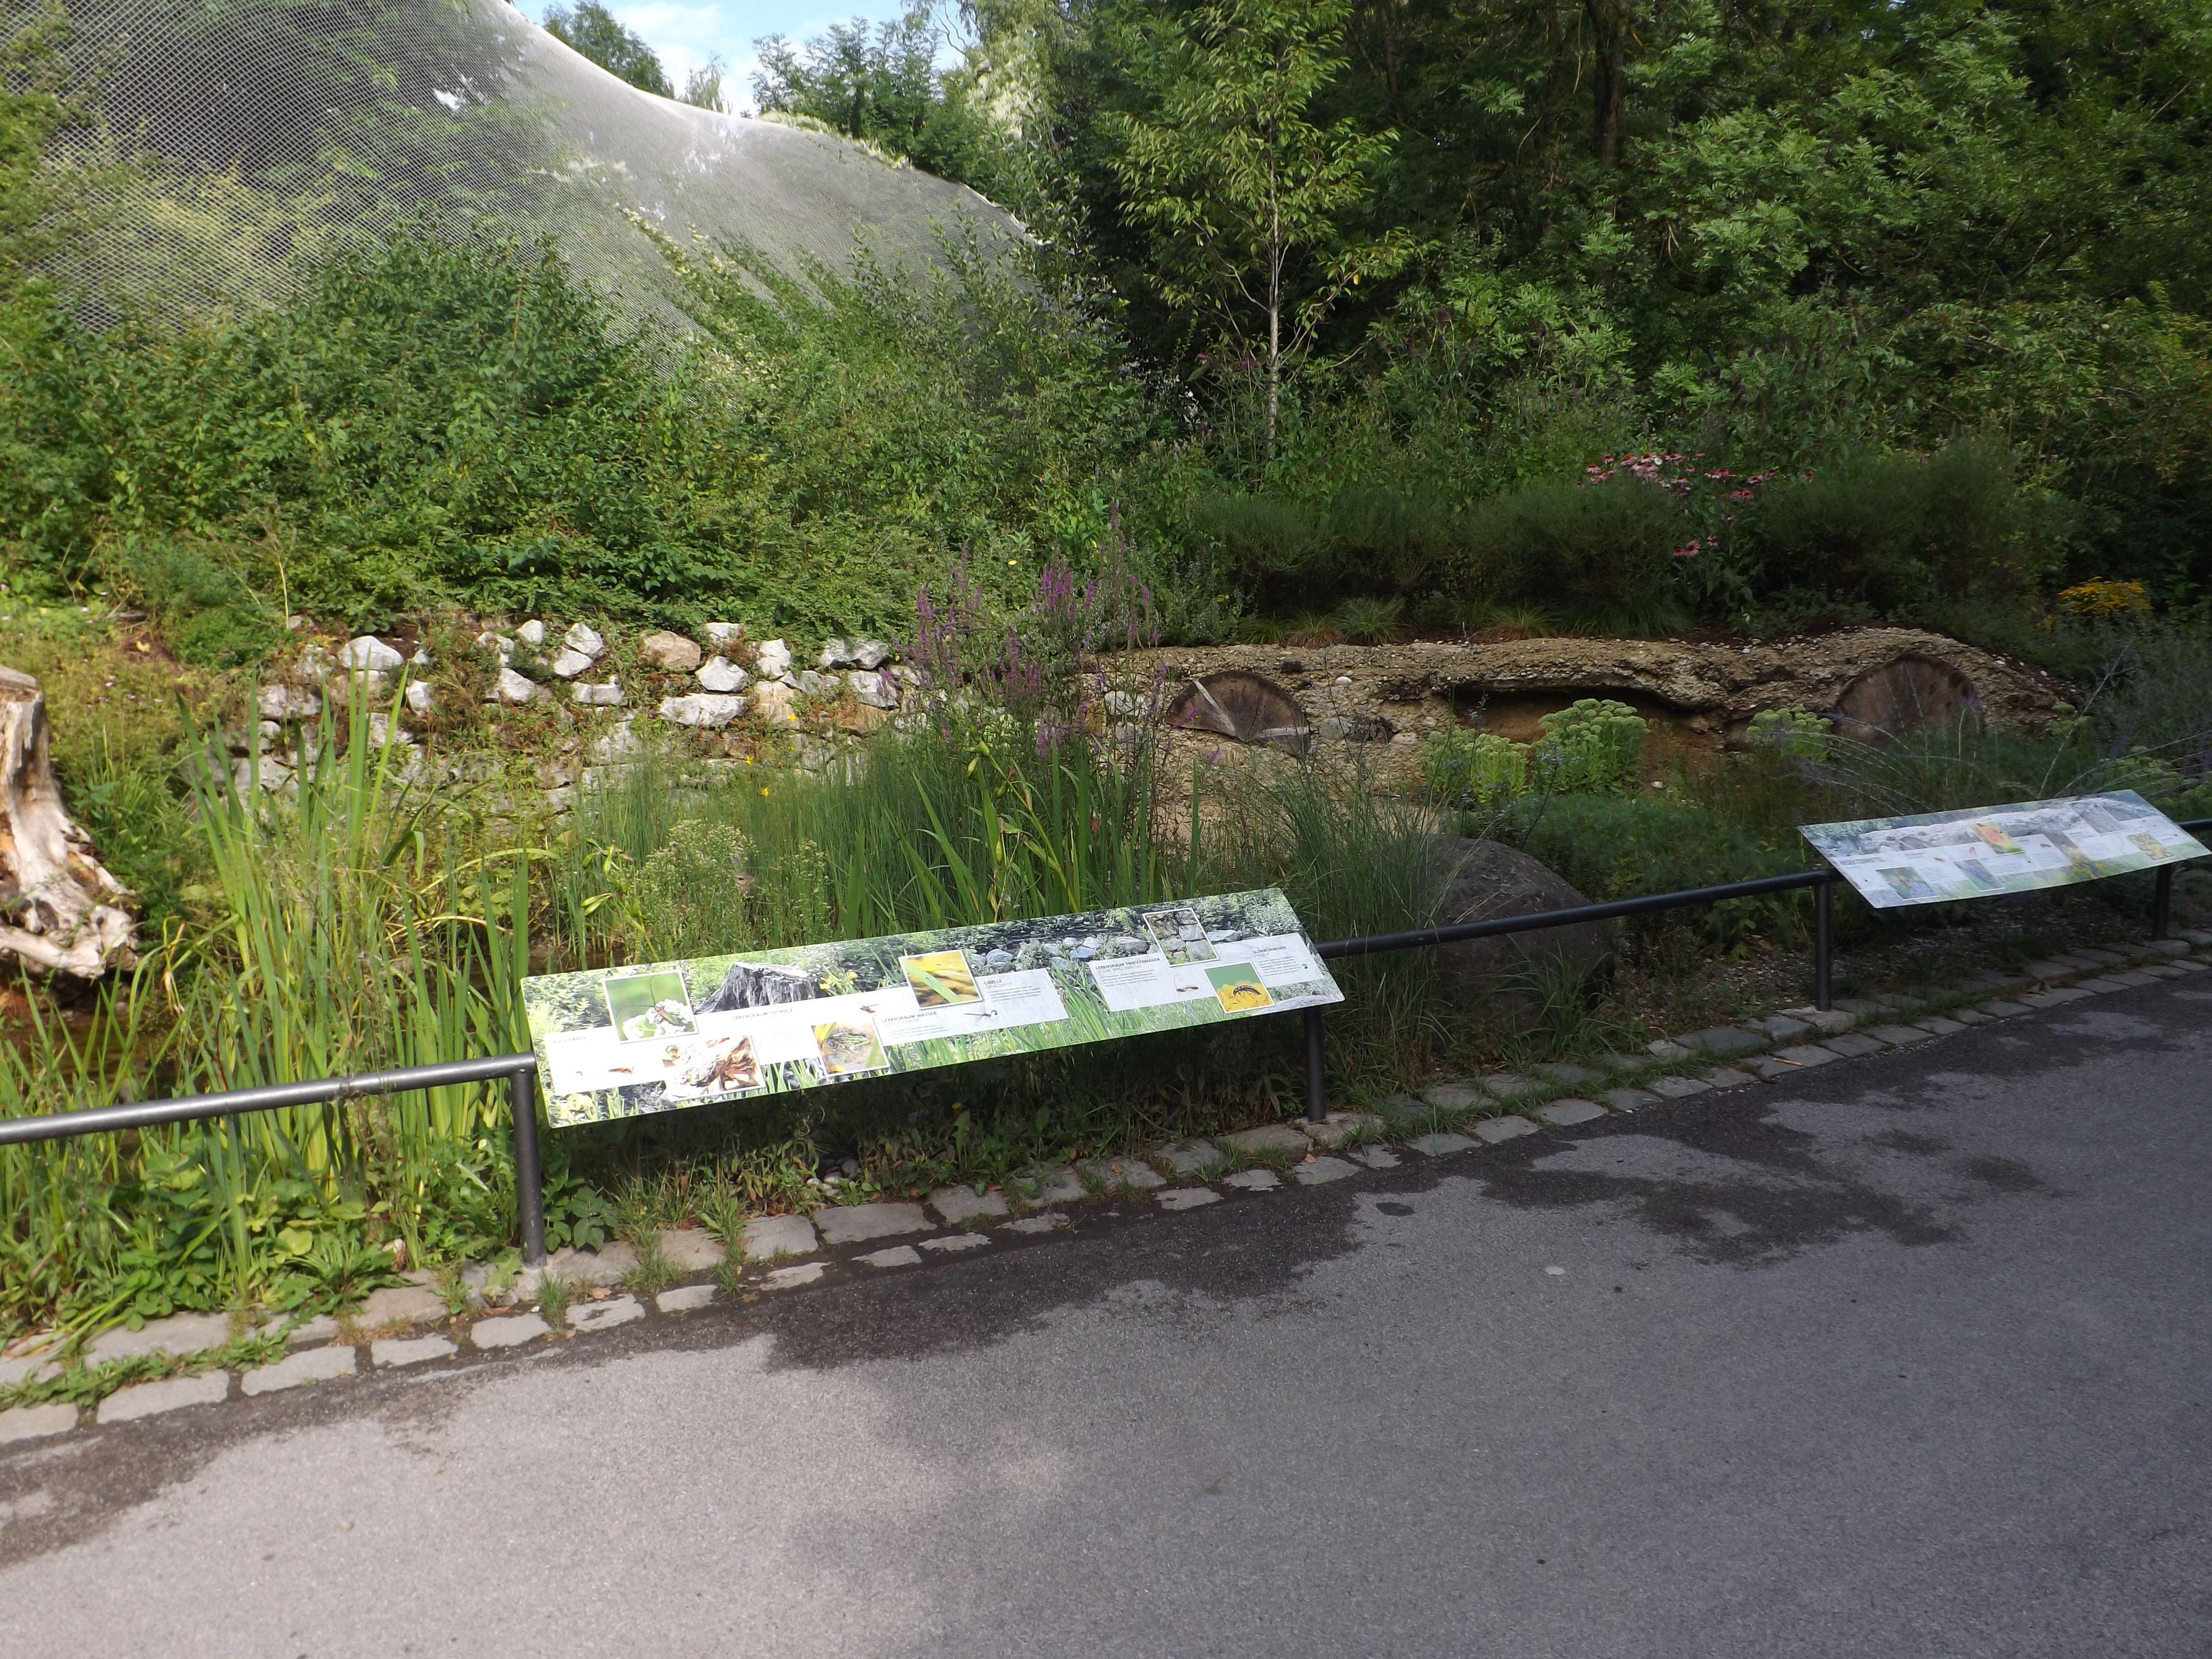 Totholz- und Feuchtbiotop (Tierpark Hellabrunn)